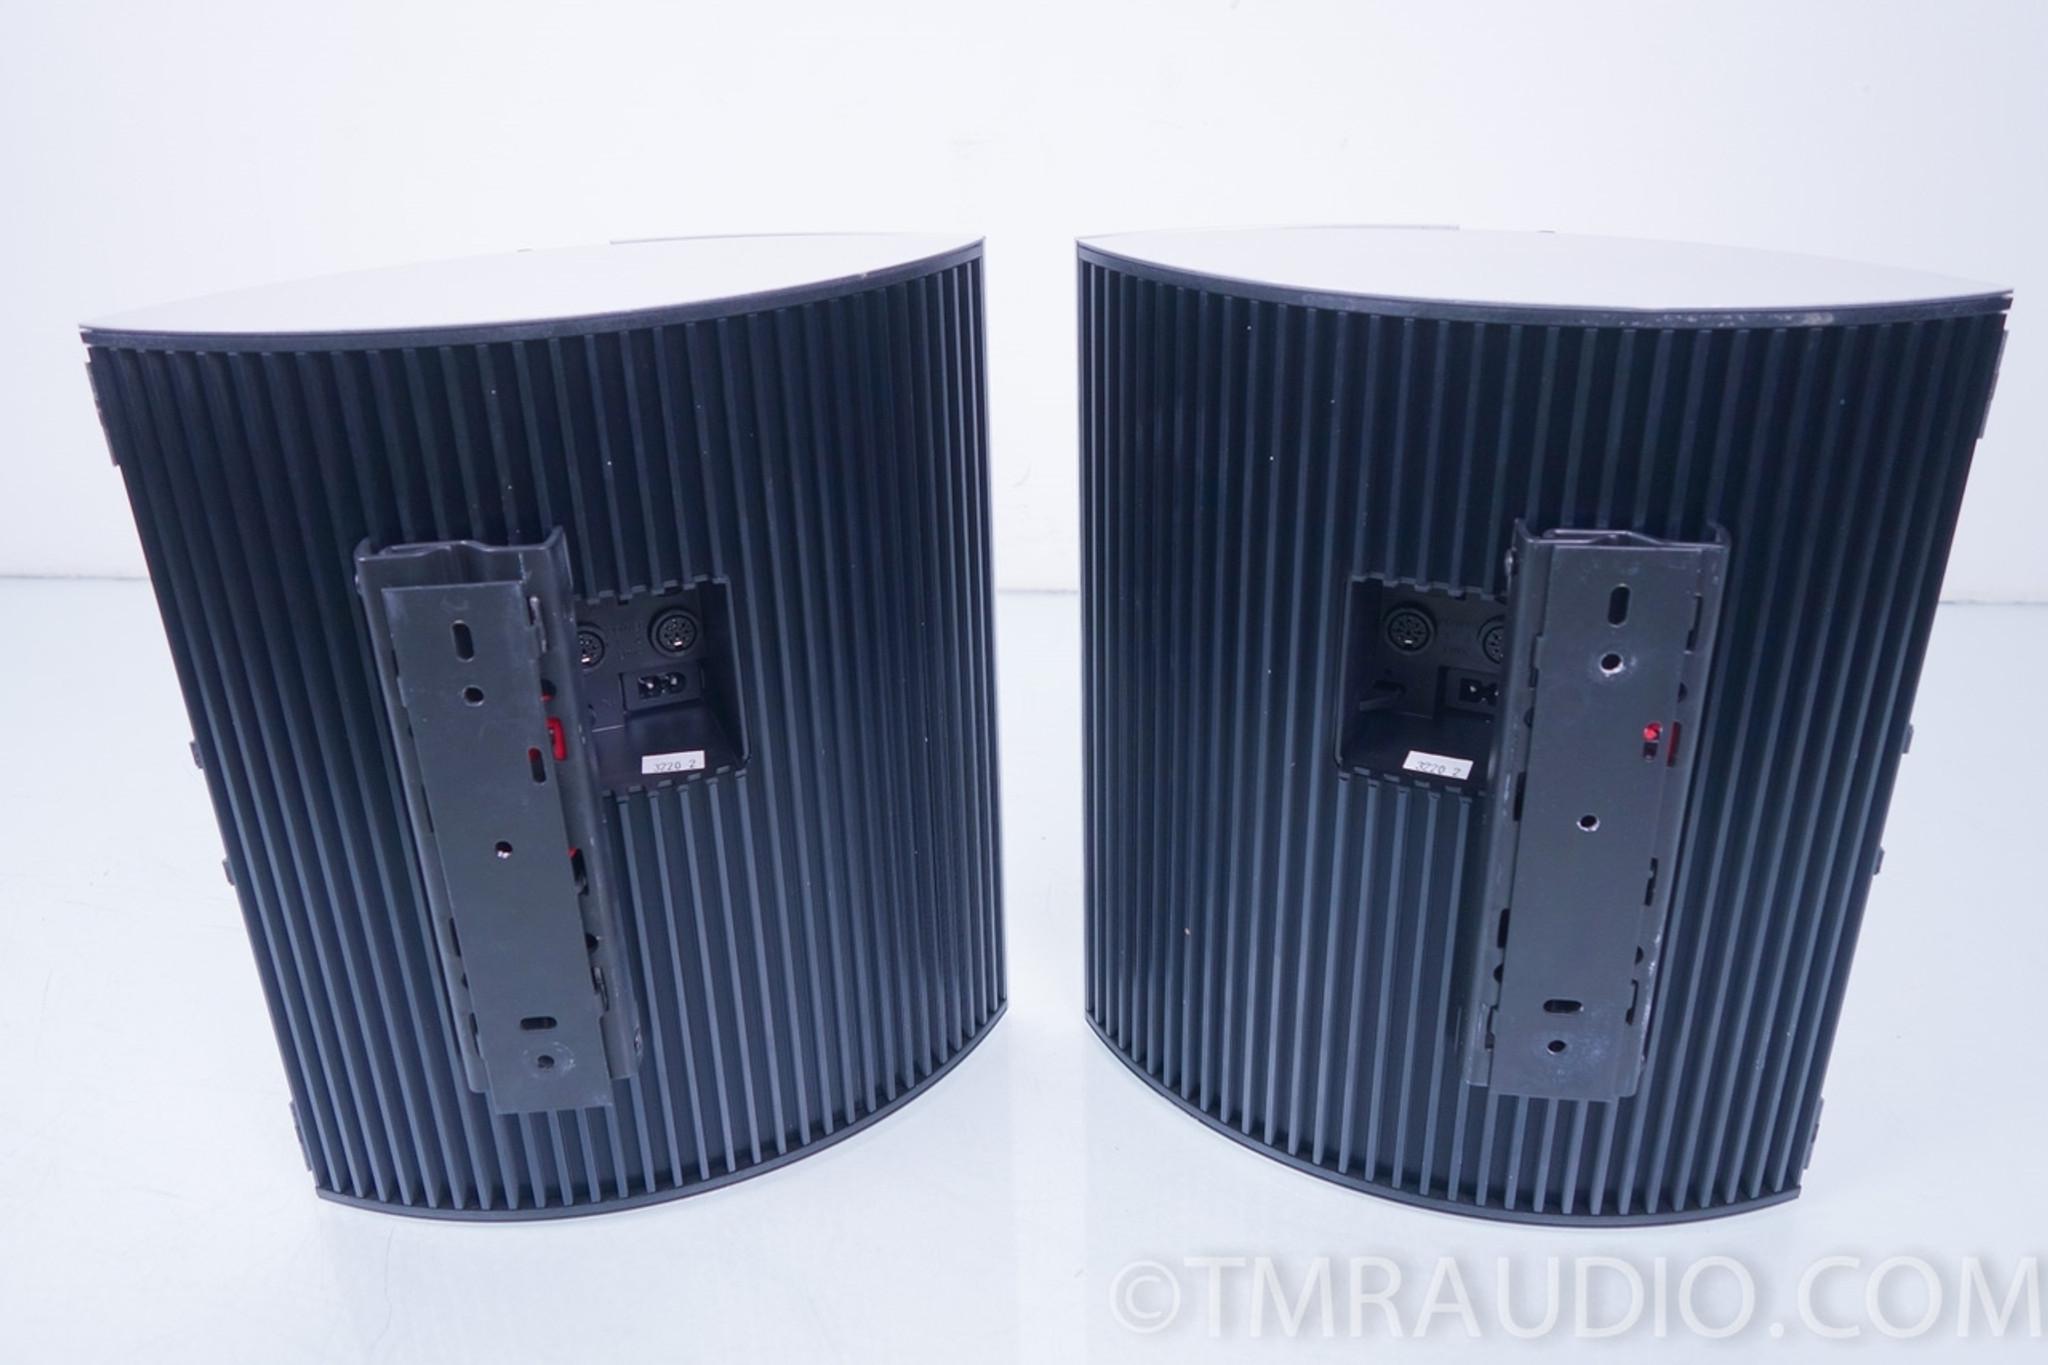 Bang Amp Olufsen Beolab 4000 Speakers W Wall Brackets B Amp O